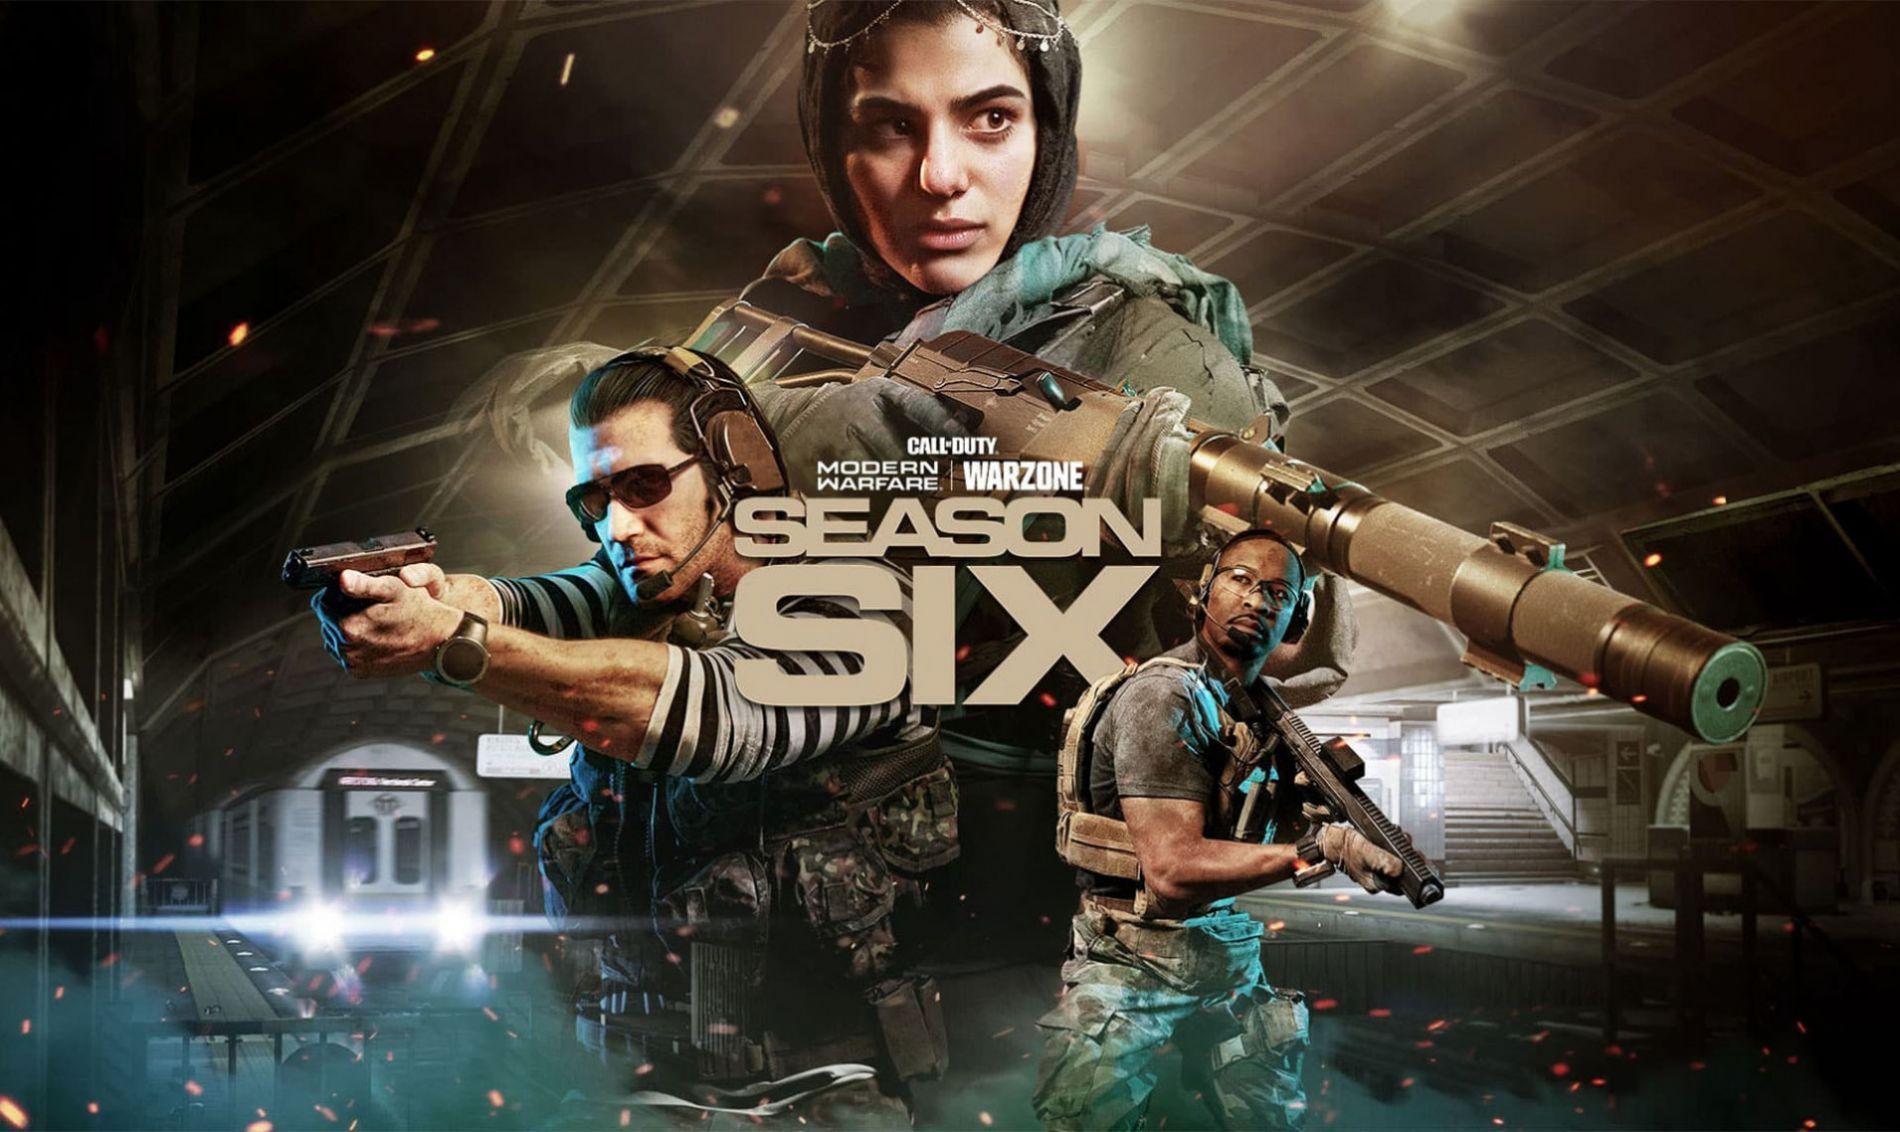 'Tiësto, SWACQ - Party Time'  in Call Of Duty Modern Warfare Warzone Season 6!